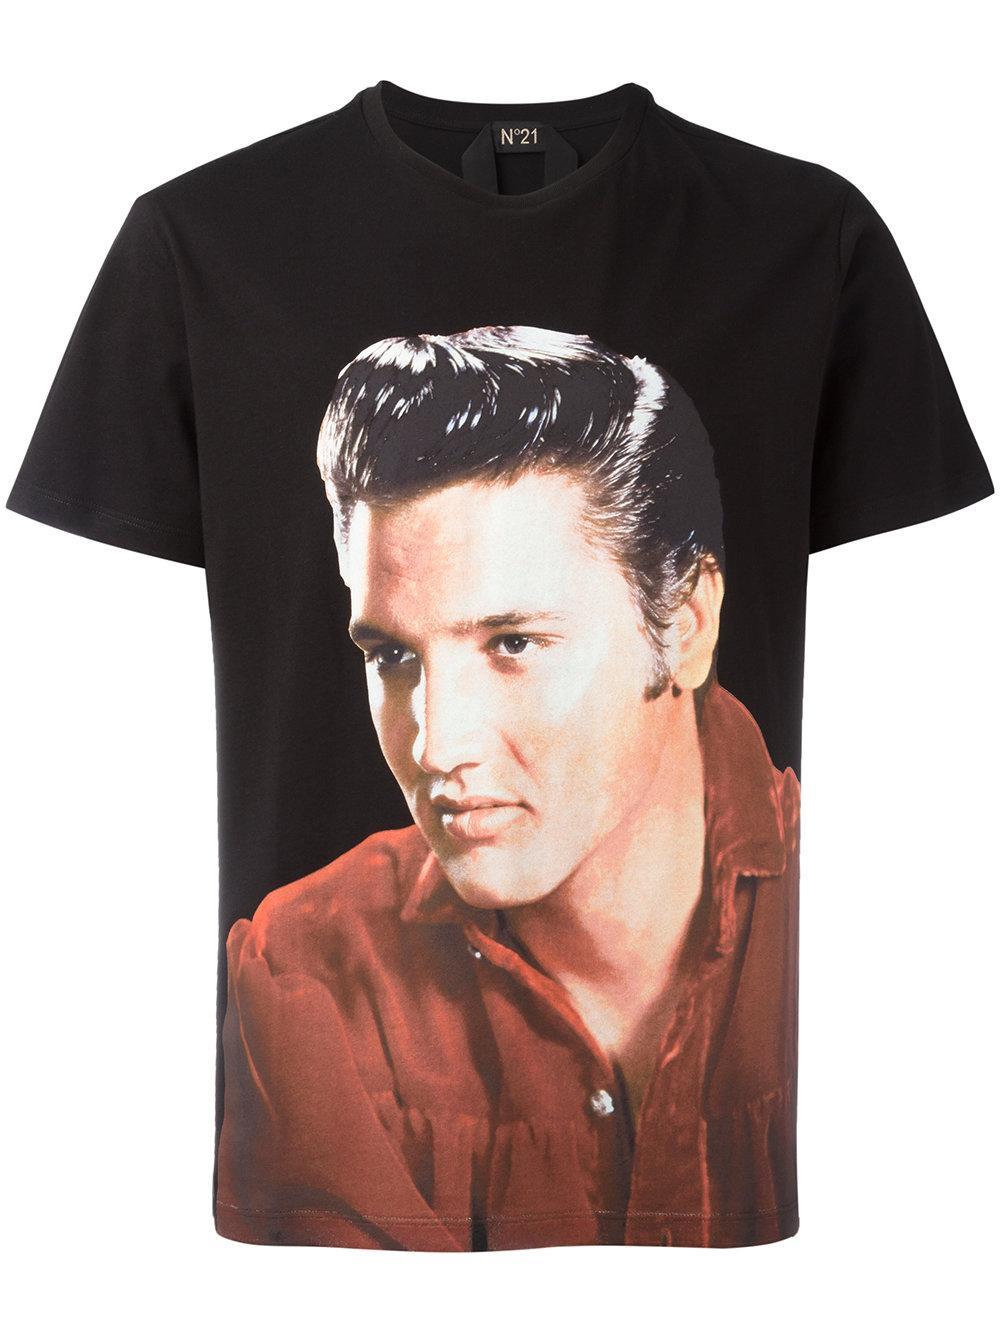 N 21 elvis t shirt in black for men lyst for Elvis t shirts for men